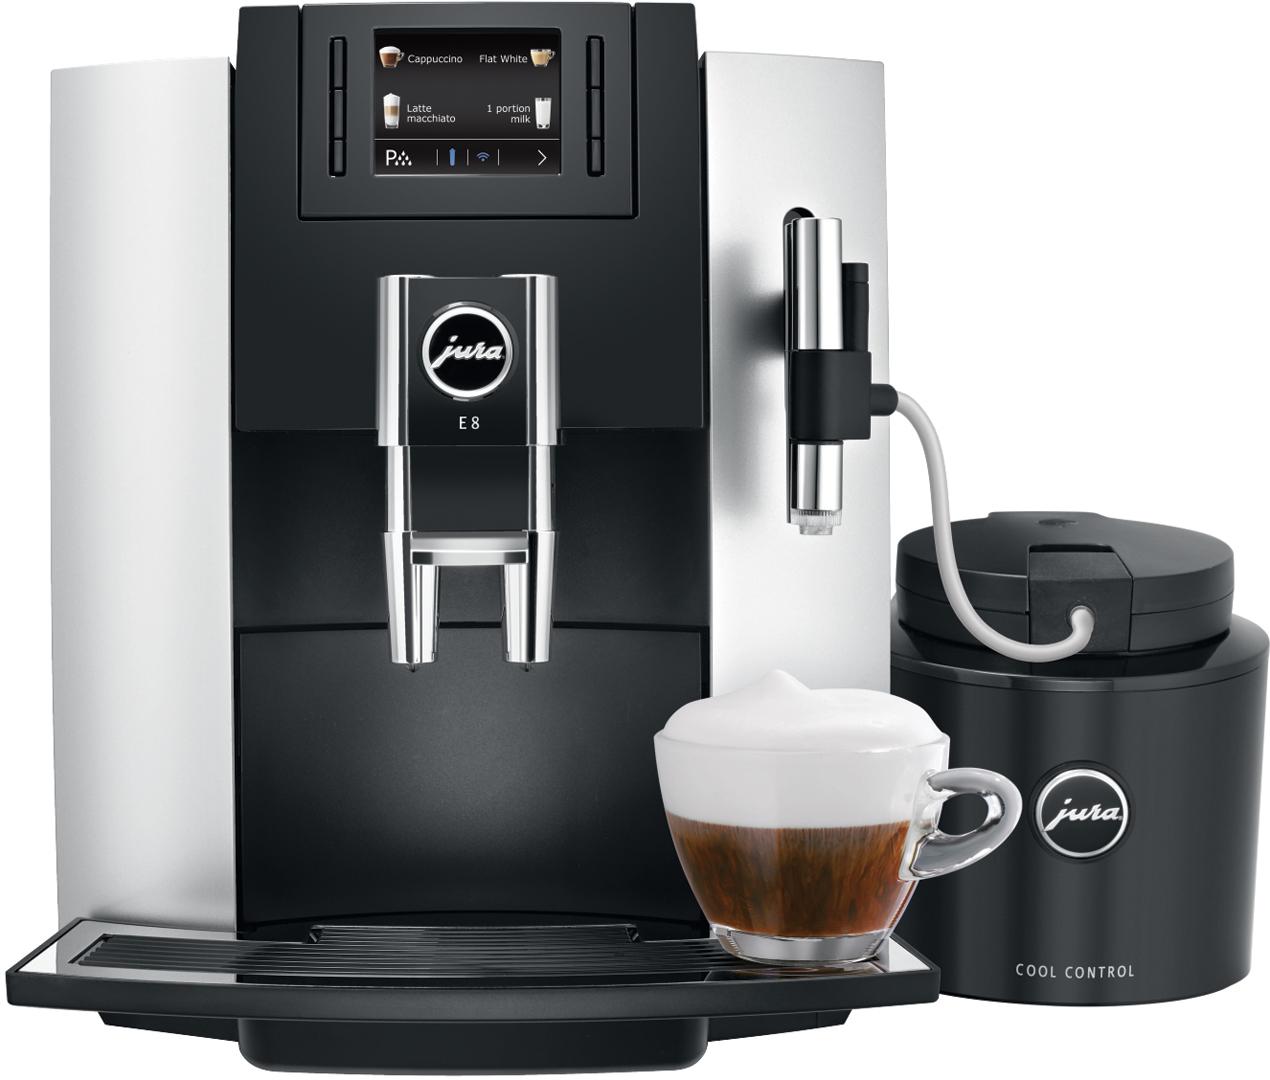 product description - Jura Coffee Maker